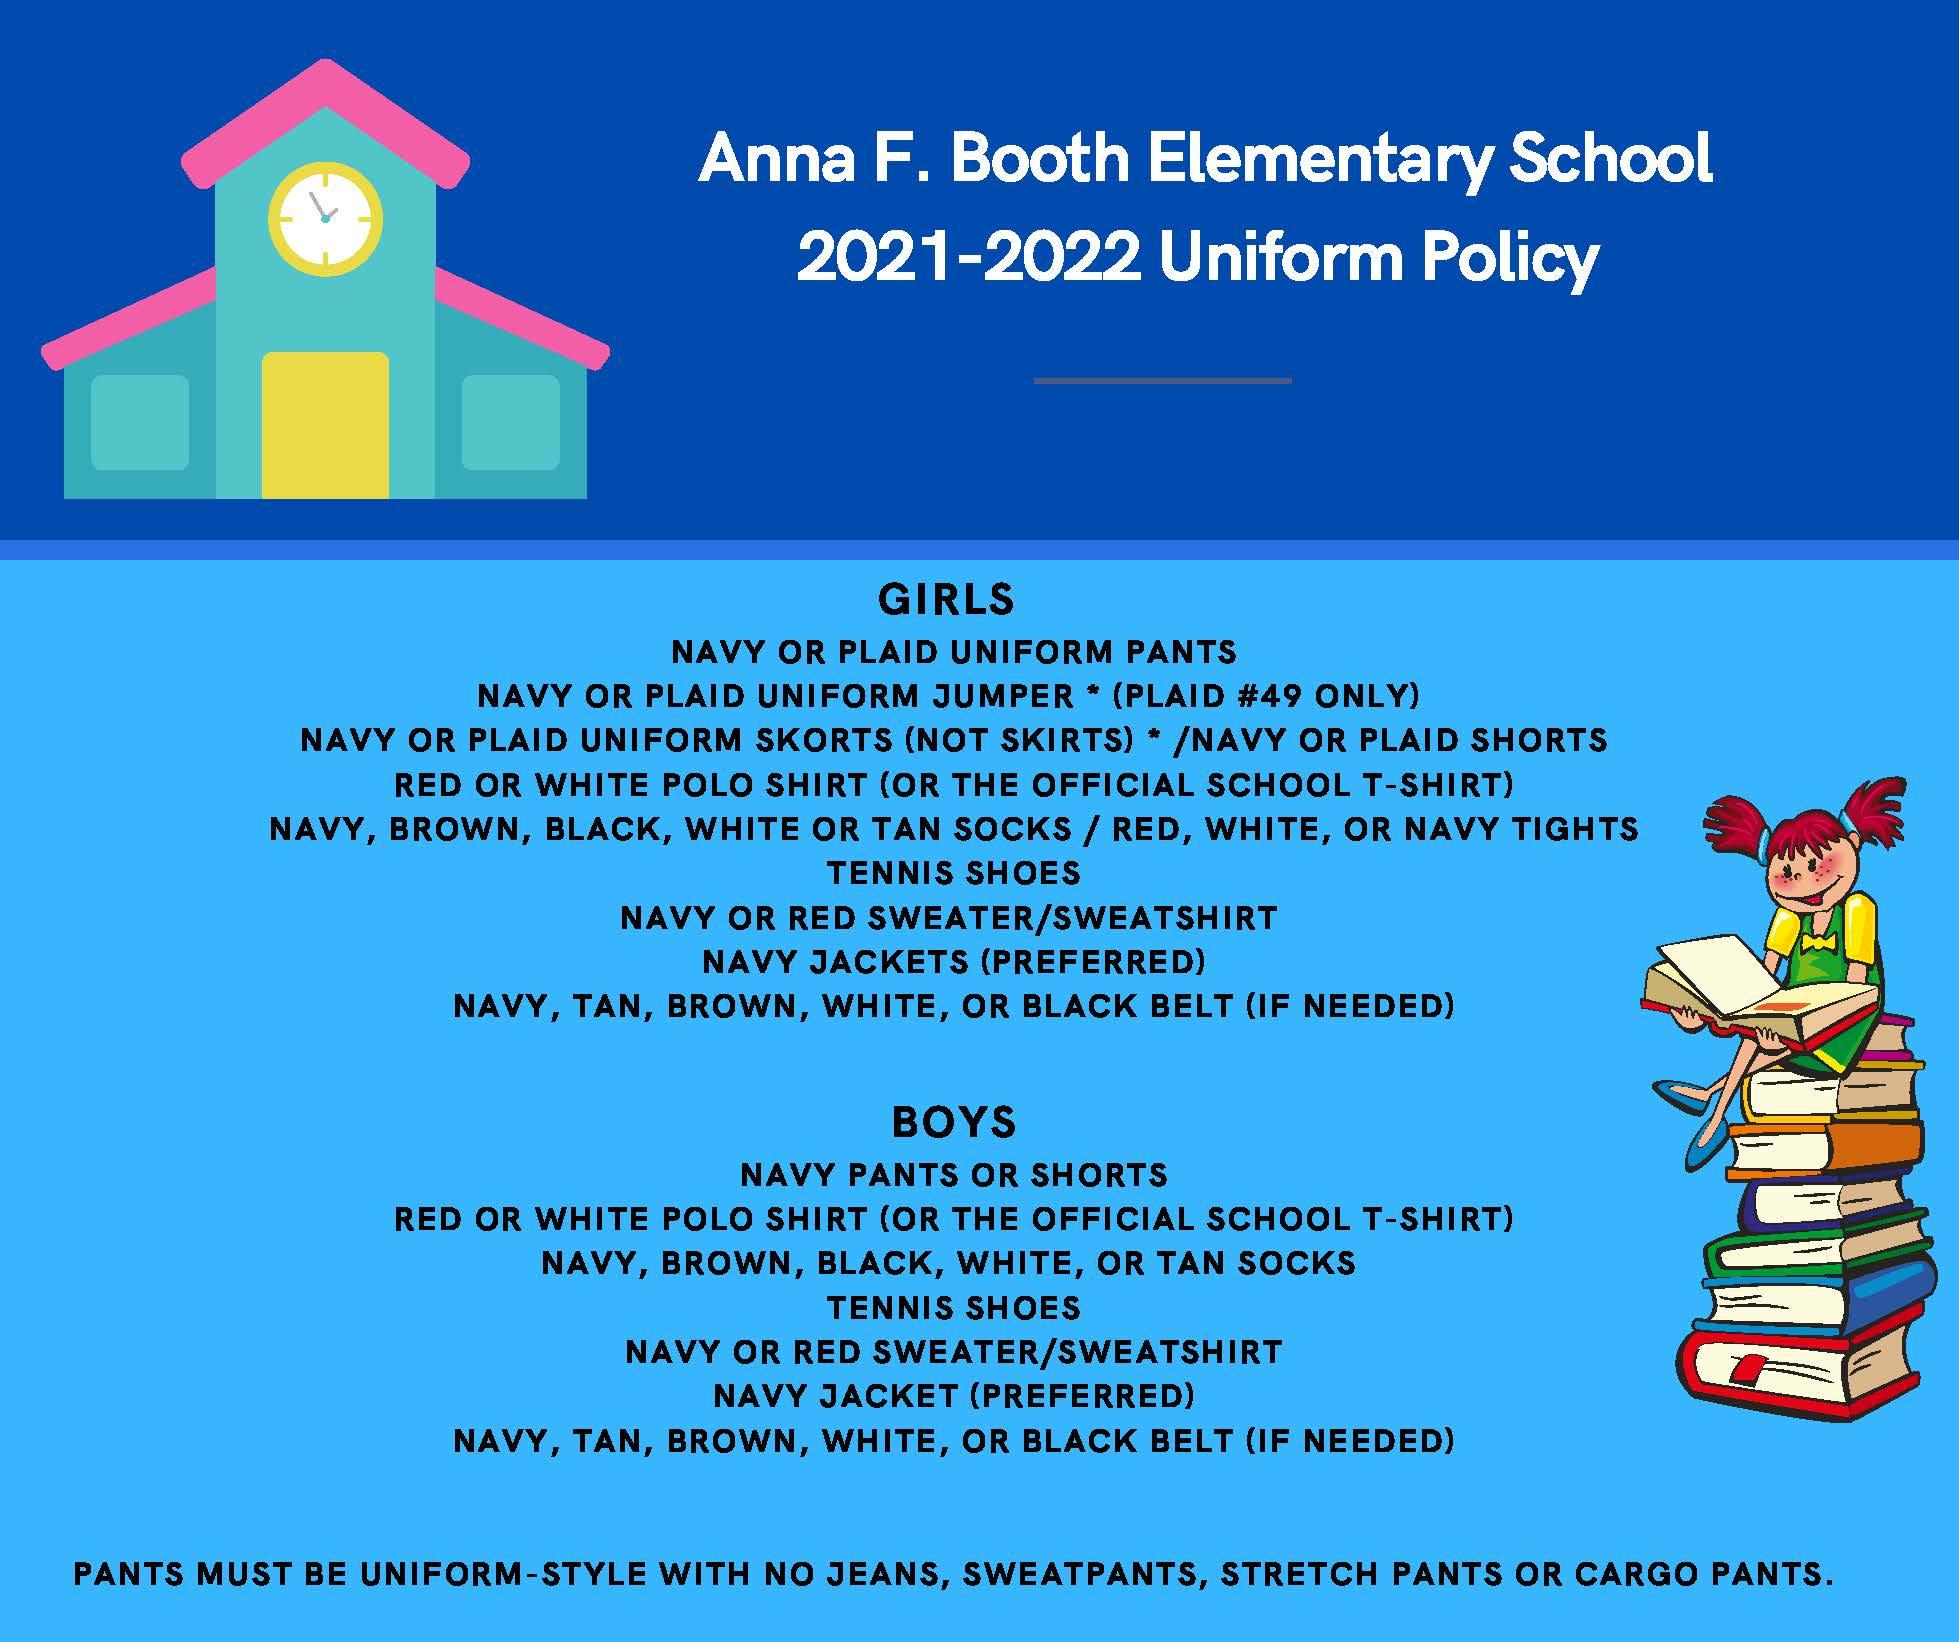 2021-2022 Uniform Policy